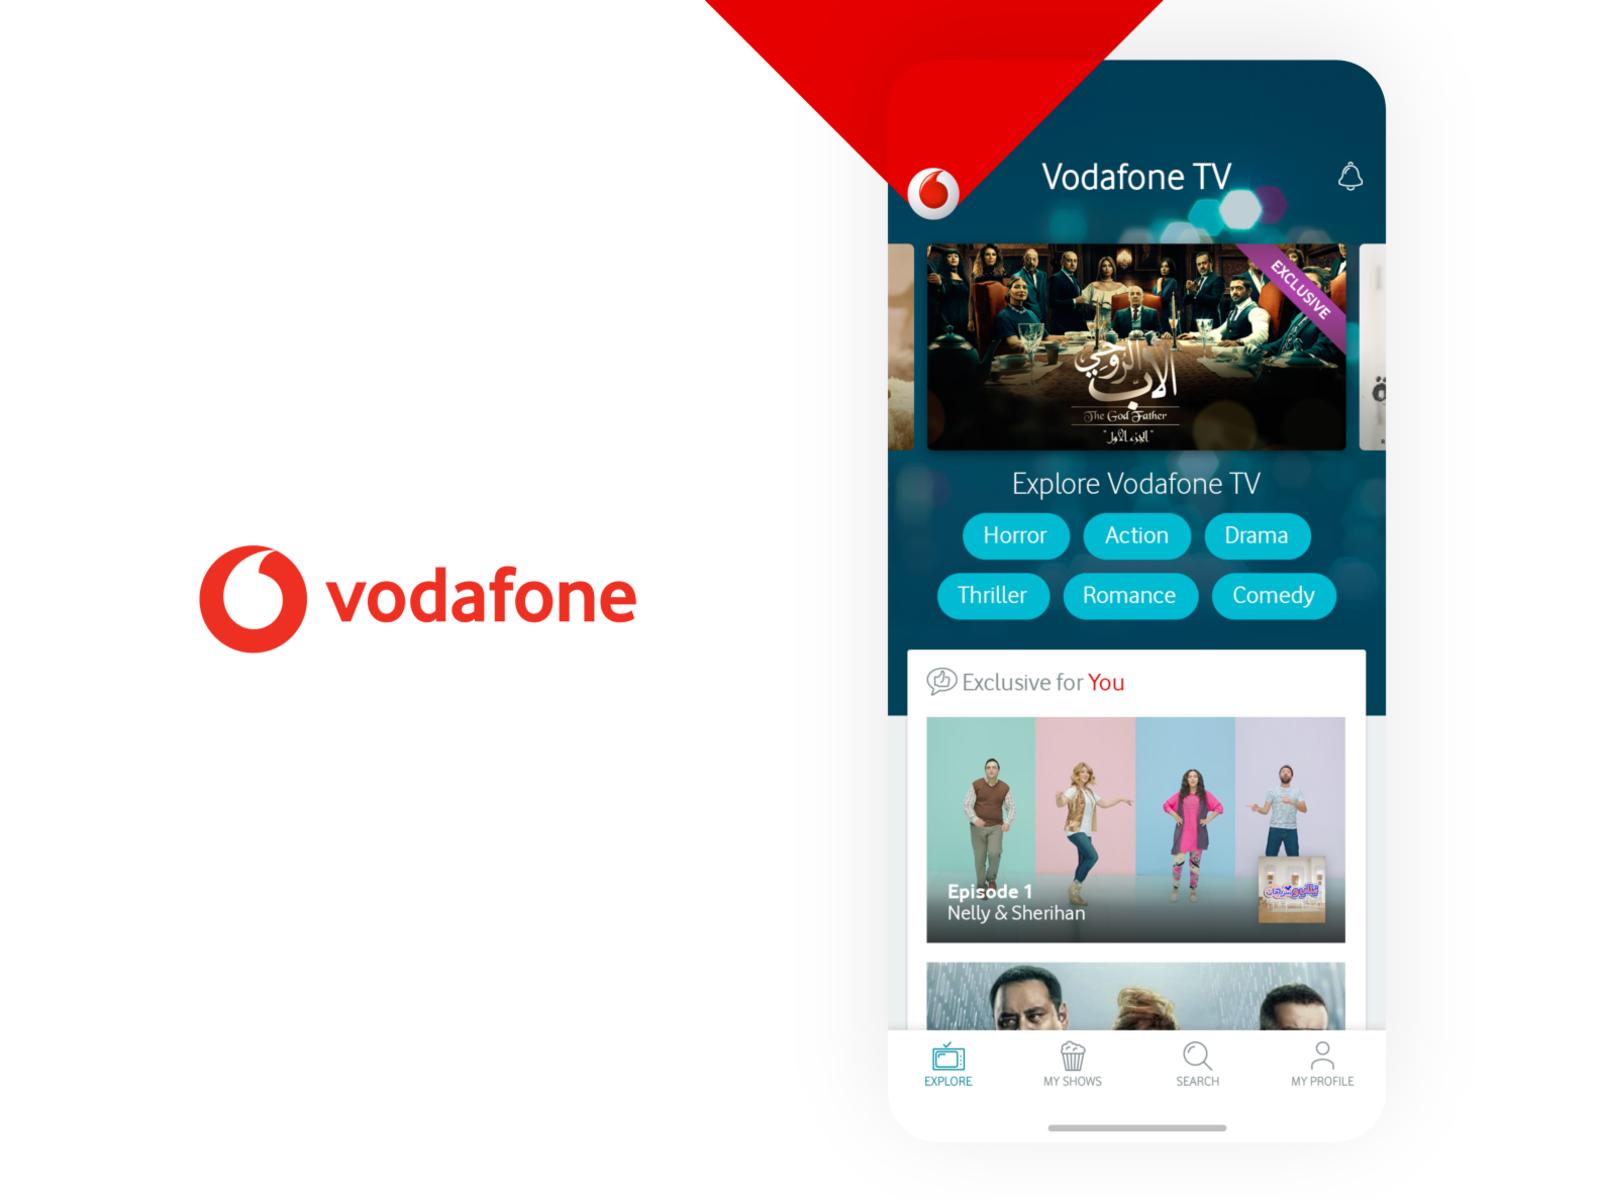 Vodafone TV Online Video Streaming App Concept Design by Ahmed Kamal Ali on  Dribbble